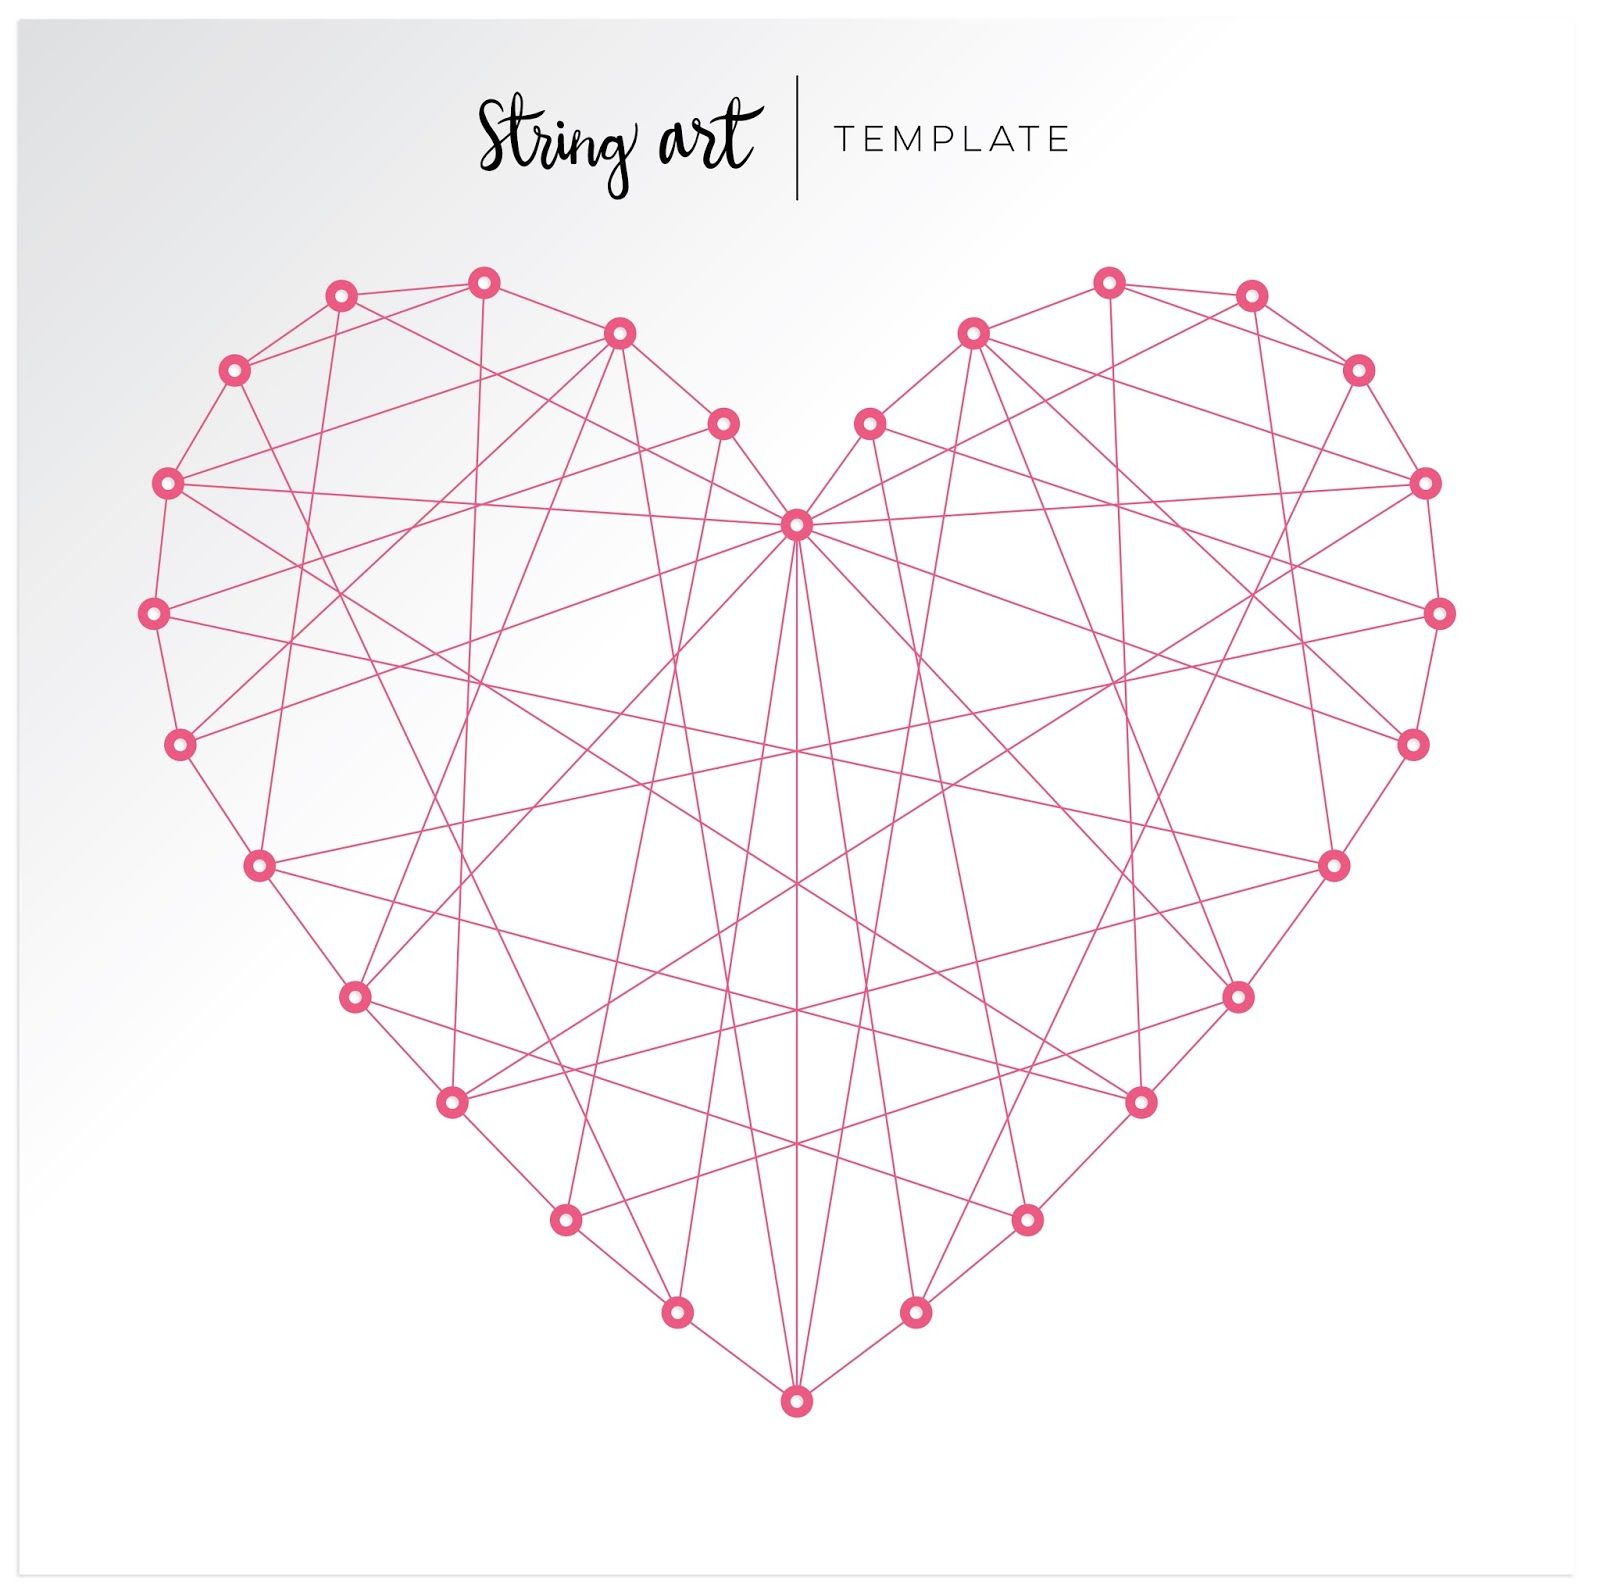 Fancy Freepaige Evans | Flipbook | Pinterest | String Art - Free Printable String Art Patterns With Instructions